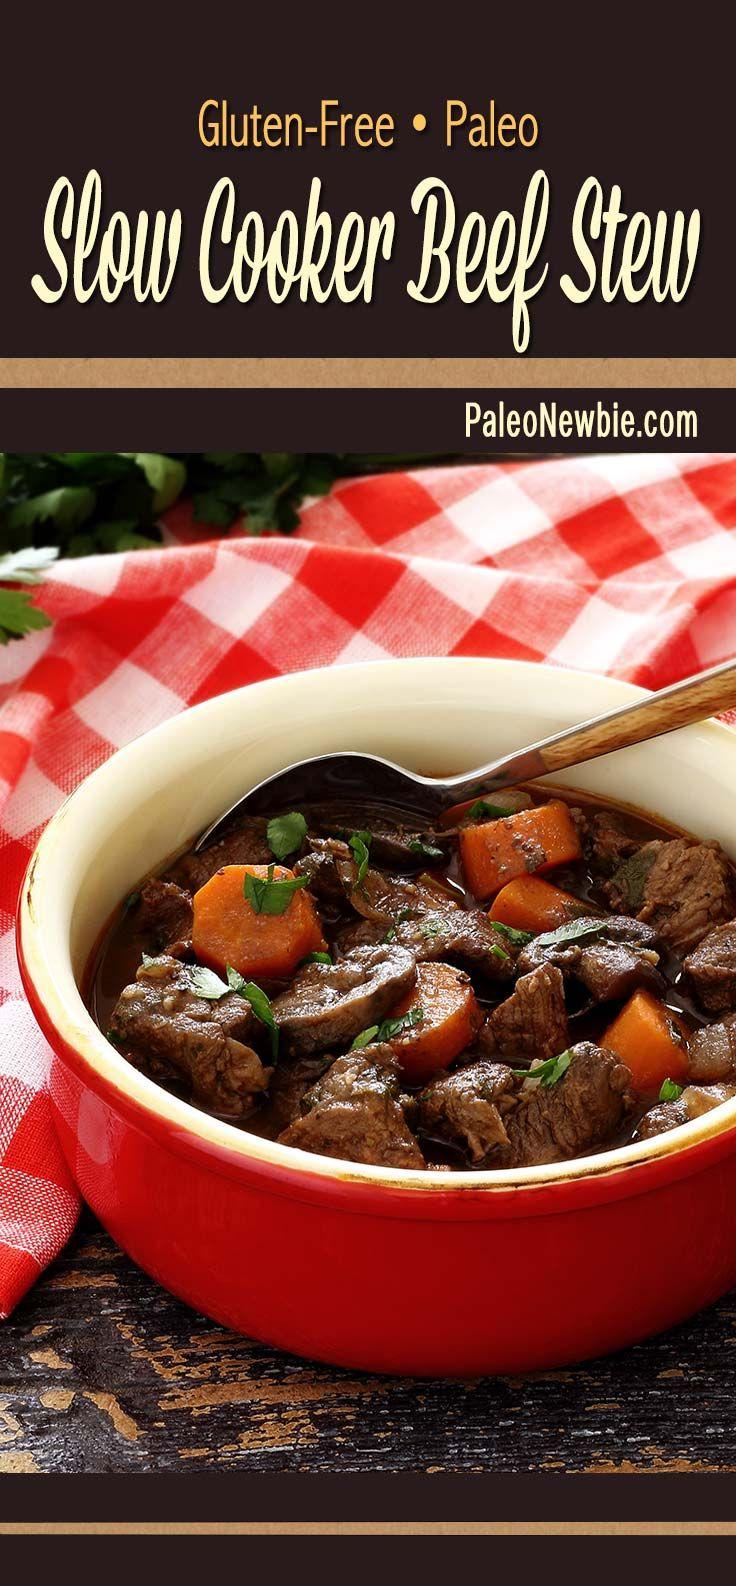 Slow Cooker Paleo Beef Stew Recipe Paleo Newbie Recipe Paleo Slow Cooker Paleo Beef Stew Gluten Free Beef Stew